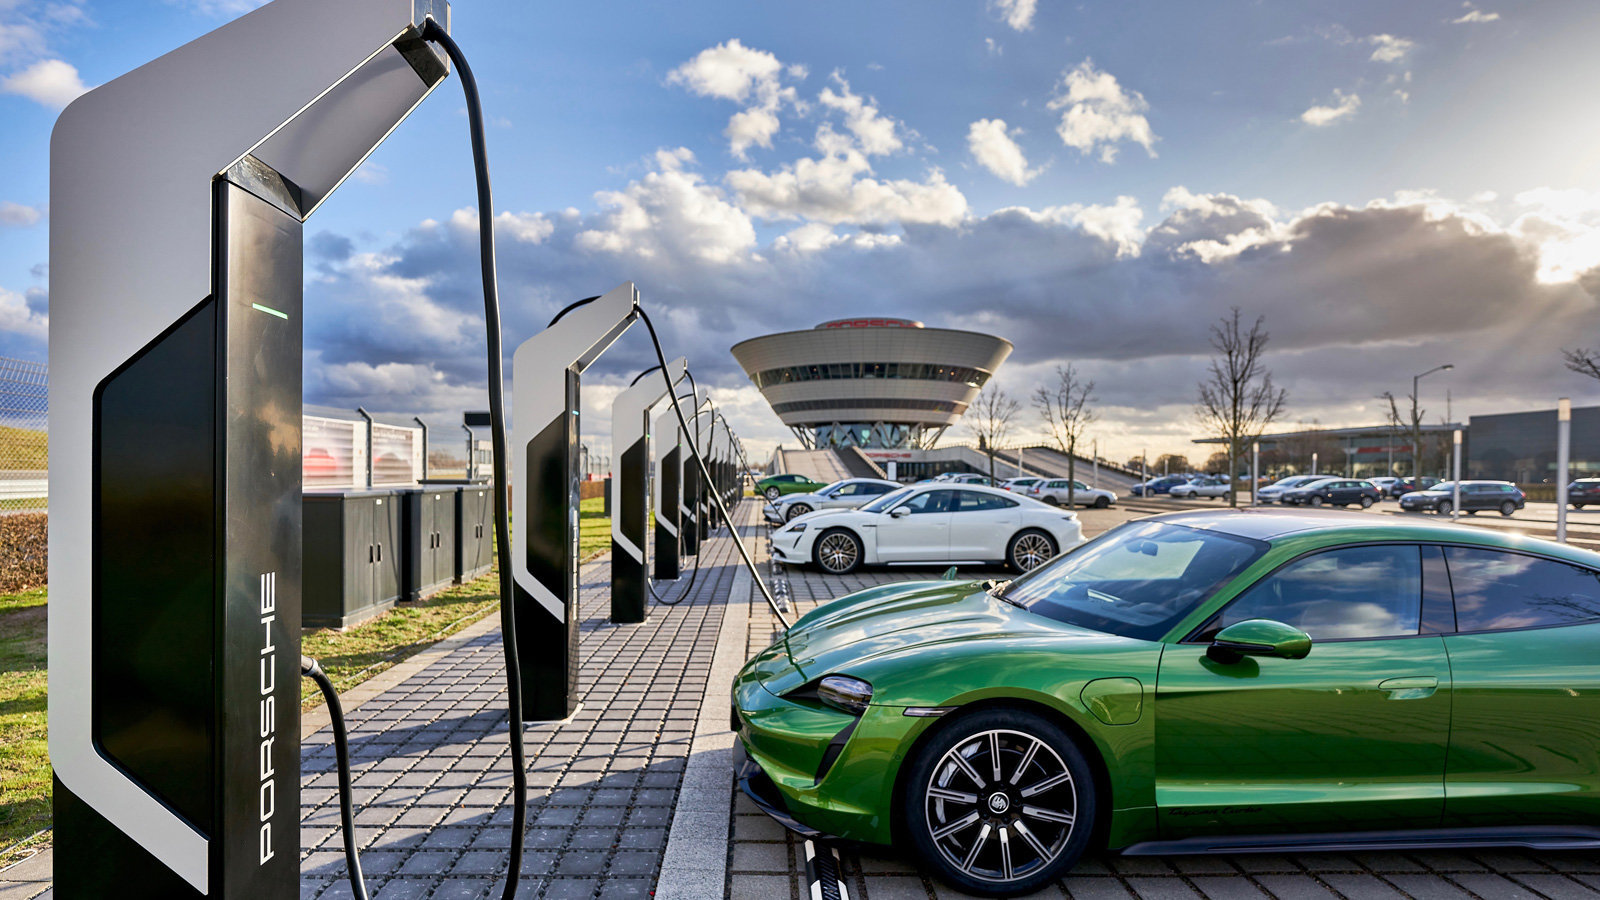 Porsche opens Europe's most powerful EV charging park保时捷开设欧洲最强大的电动汽车充电园